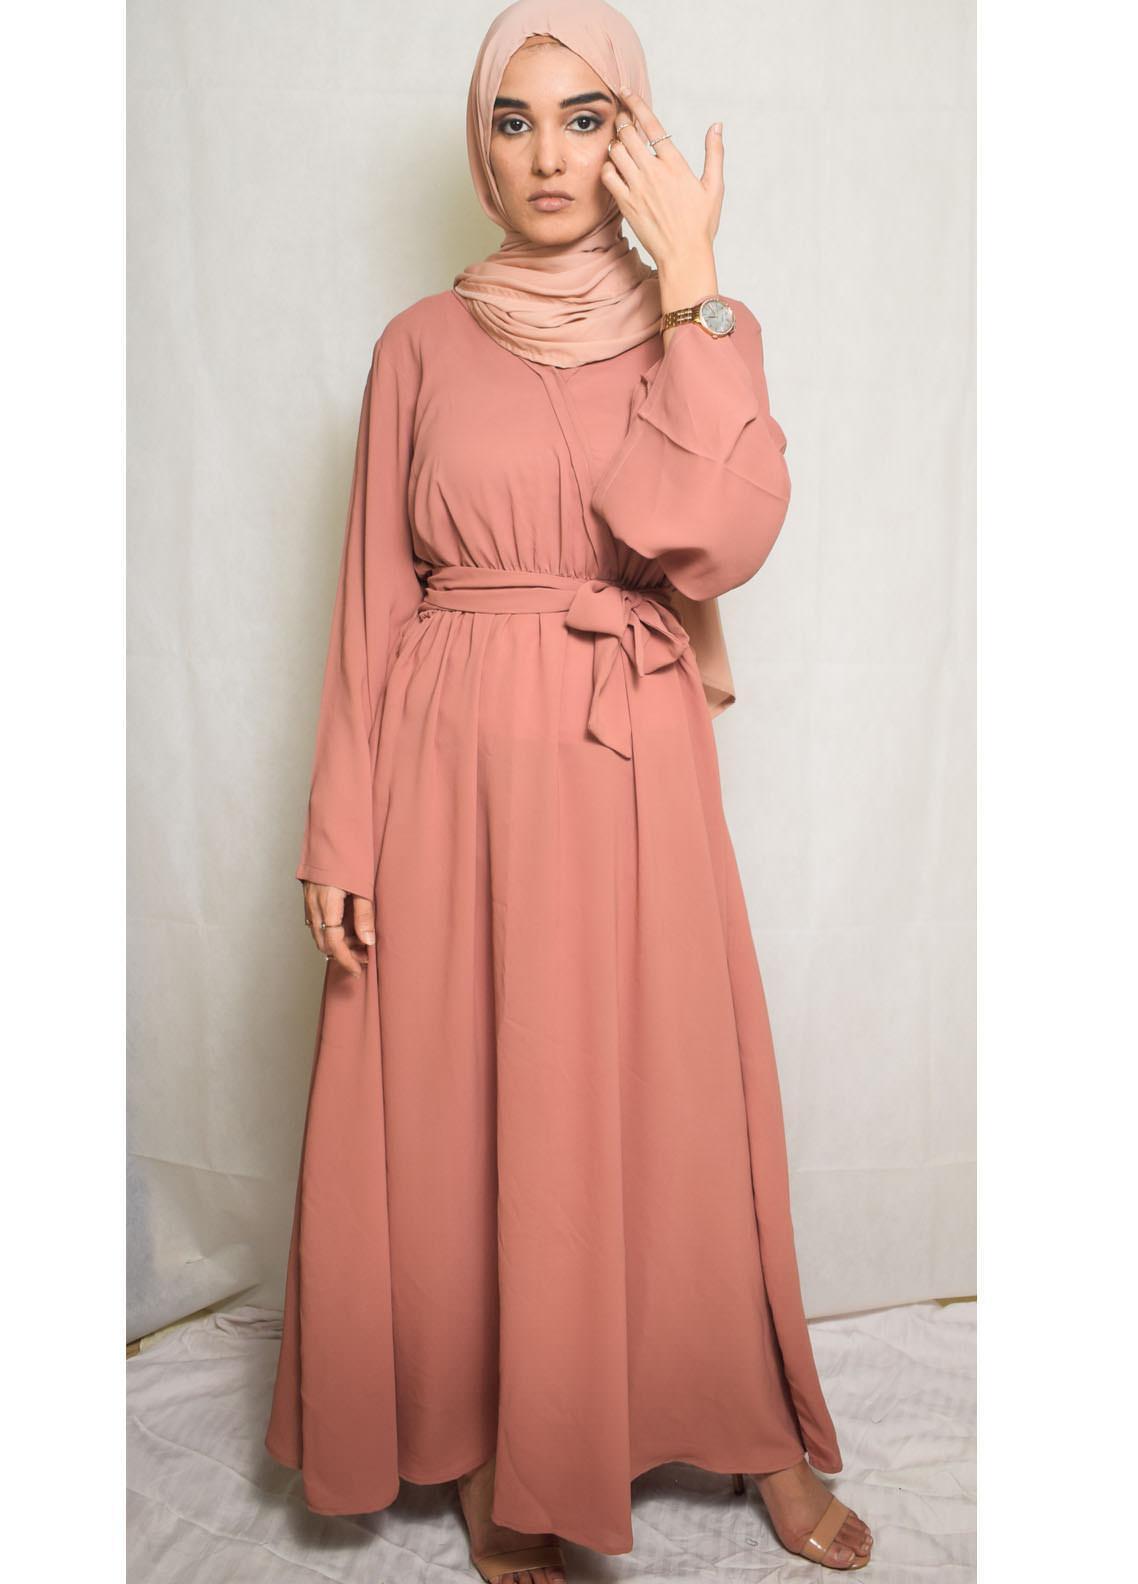 Nida Gul Fancy Georgette Stitched Maxi NG20MD D-304 Sohila Maxi Dress with Hijab